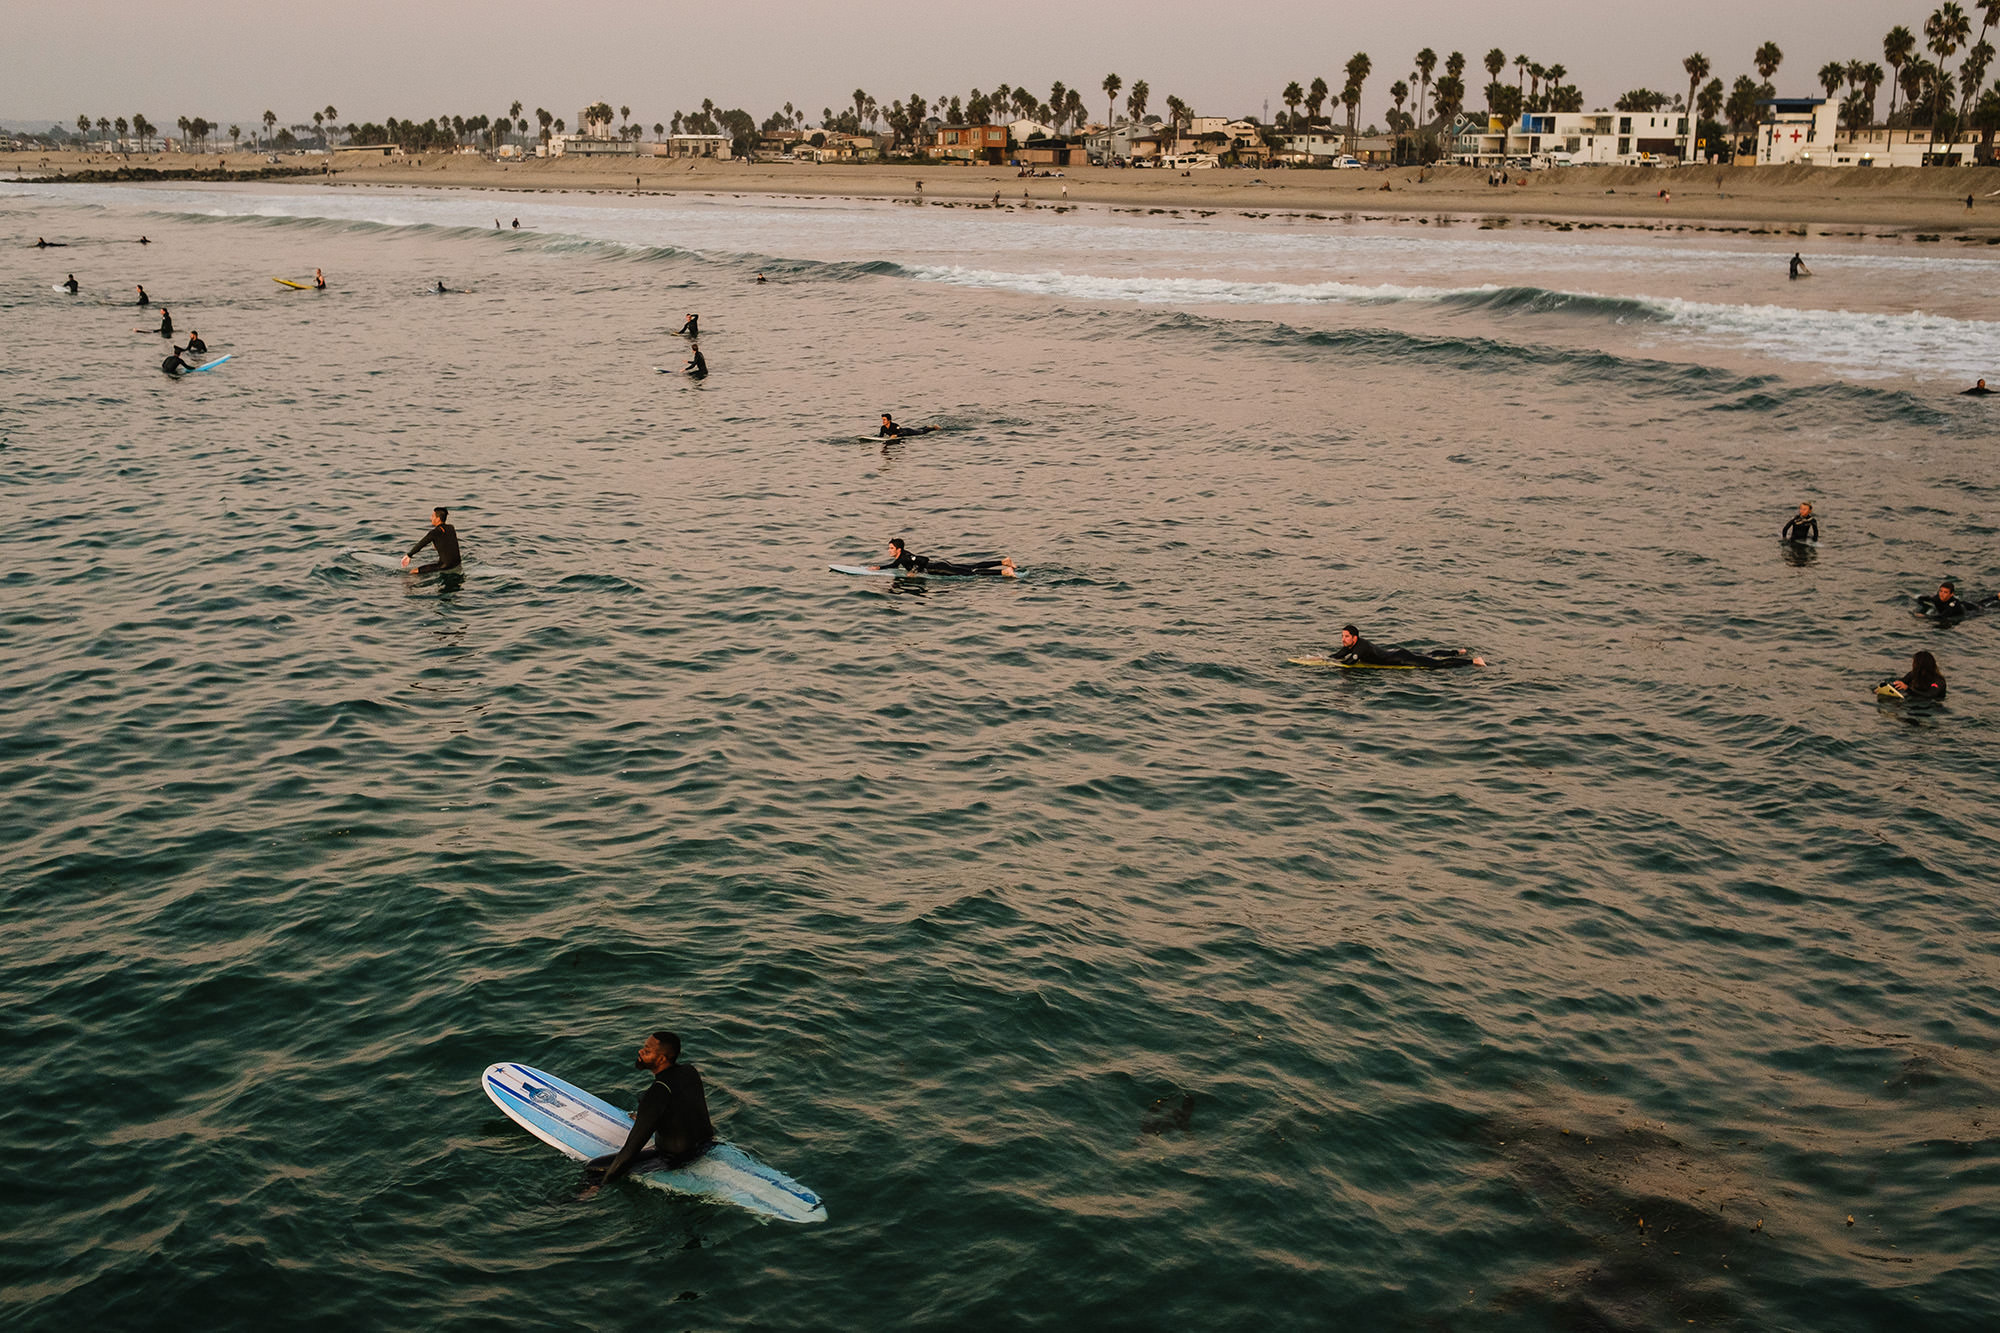 California dreaming photography